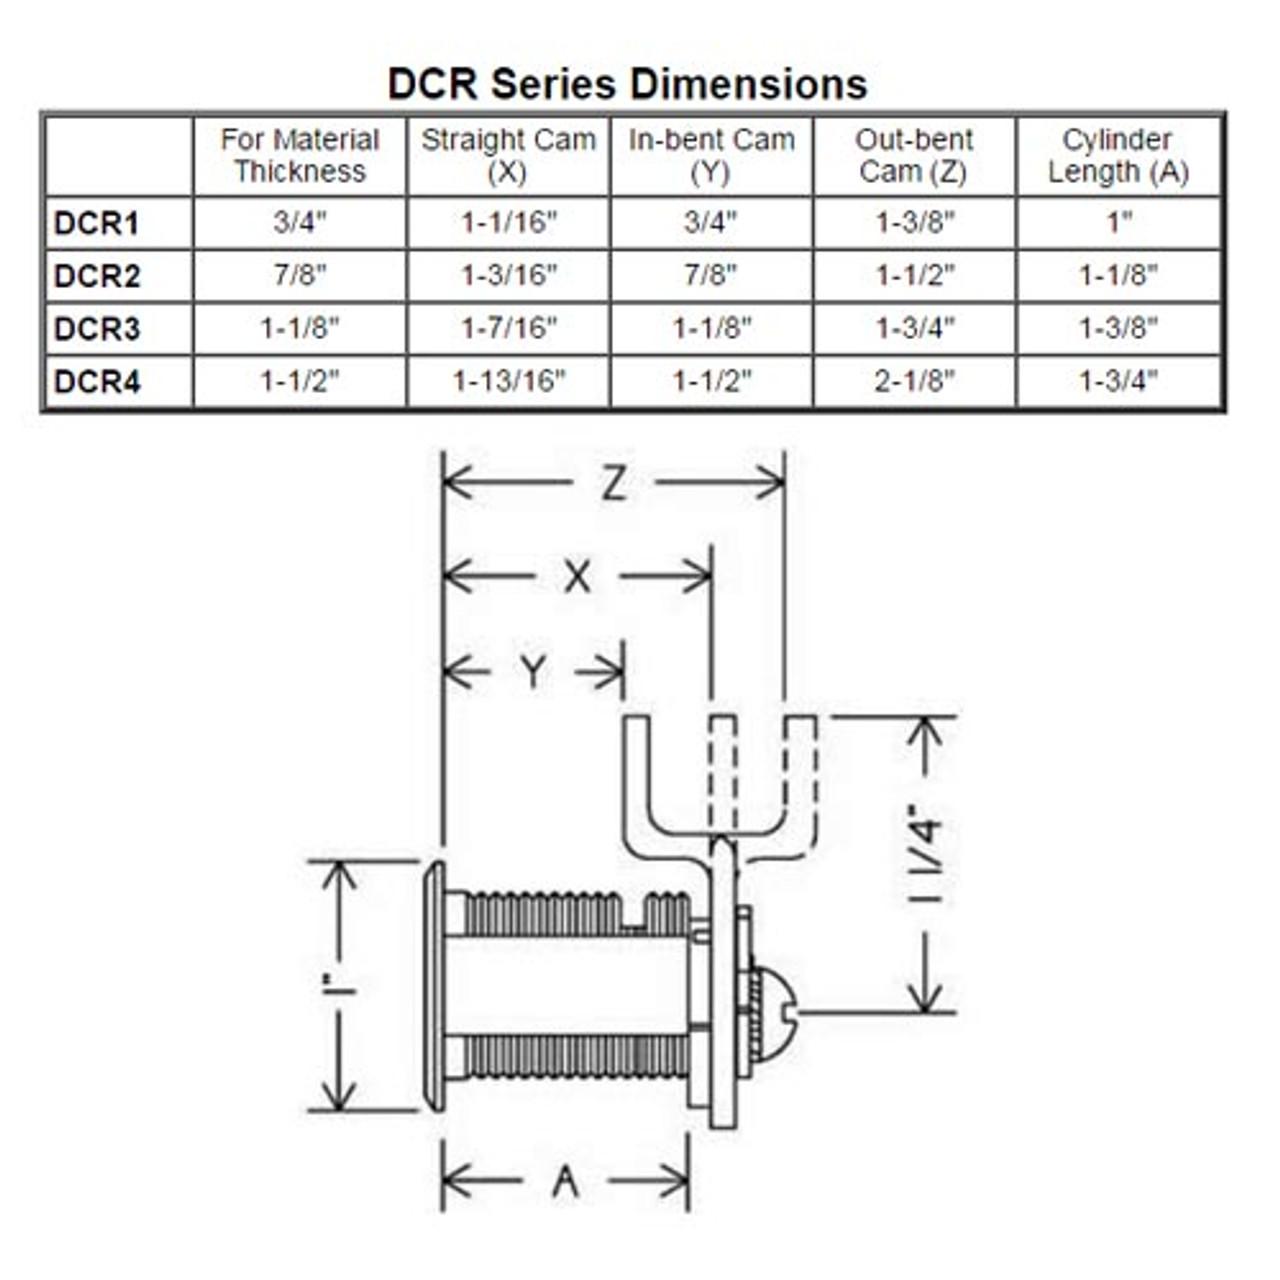 Olympus DCR3-KD-26D R Series Keyed Different Reversible Cam Lock in Satin Chrome